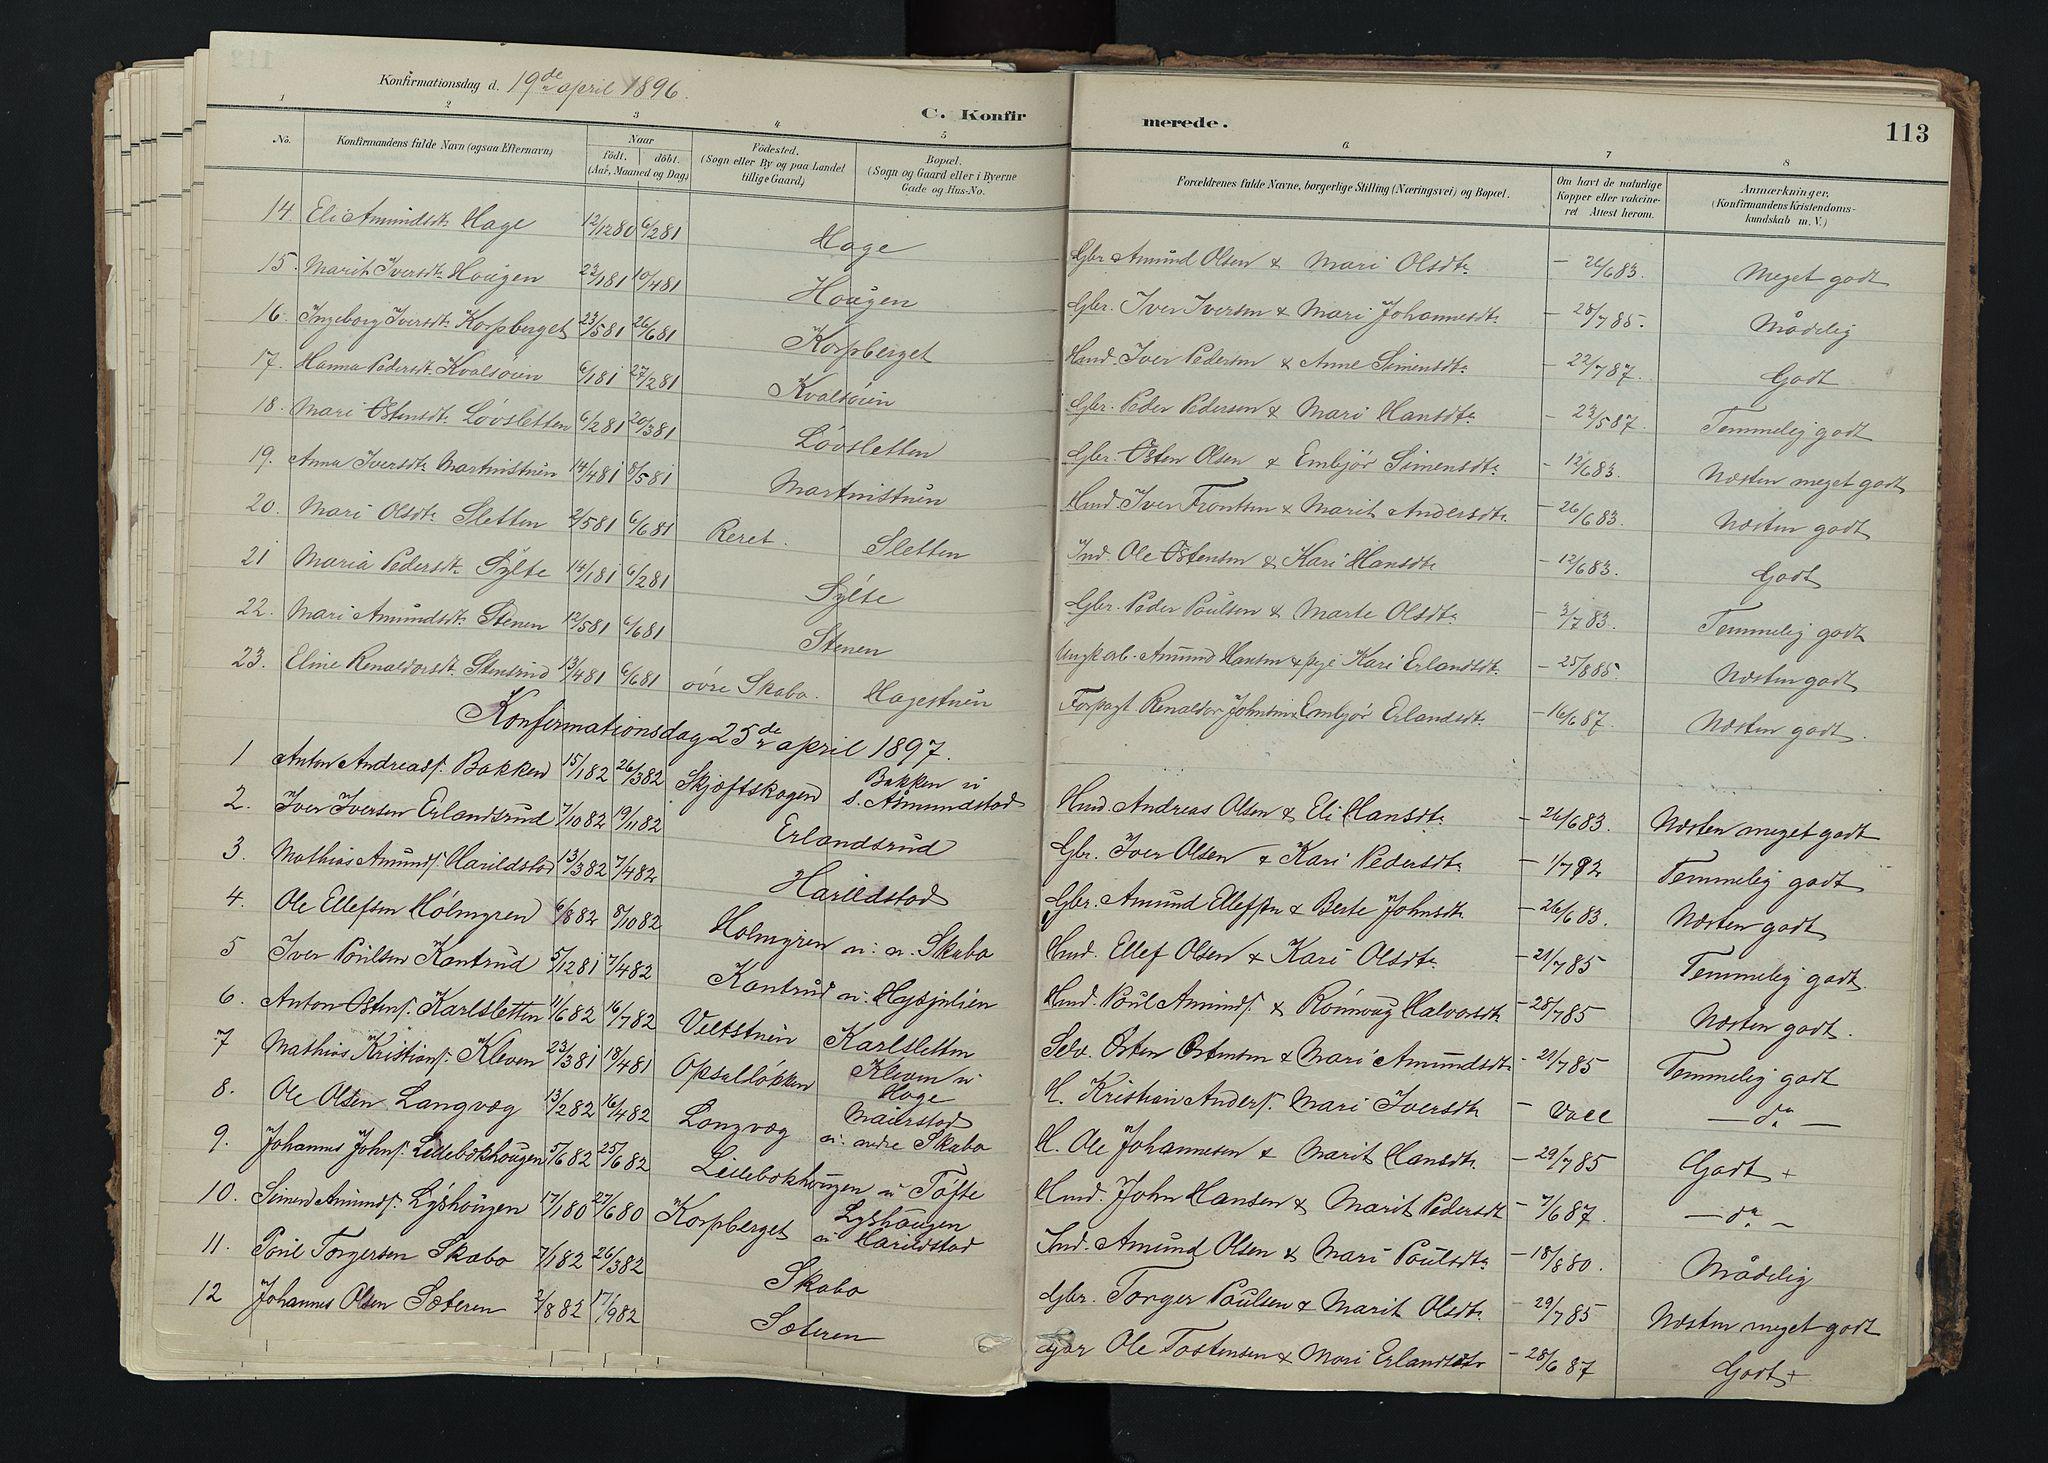 SAH, Nord-Fron prestekontor, Ministerialbok nr. 5, 1884-1914, s. 113